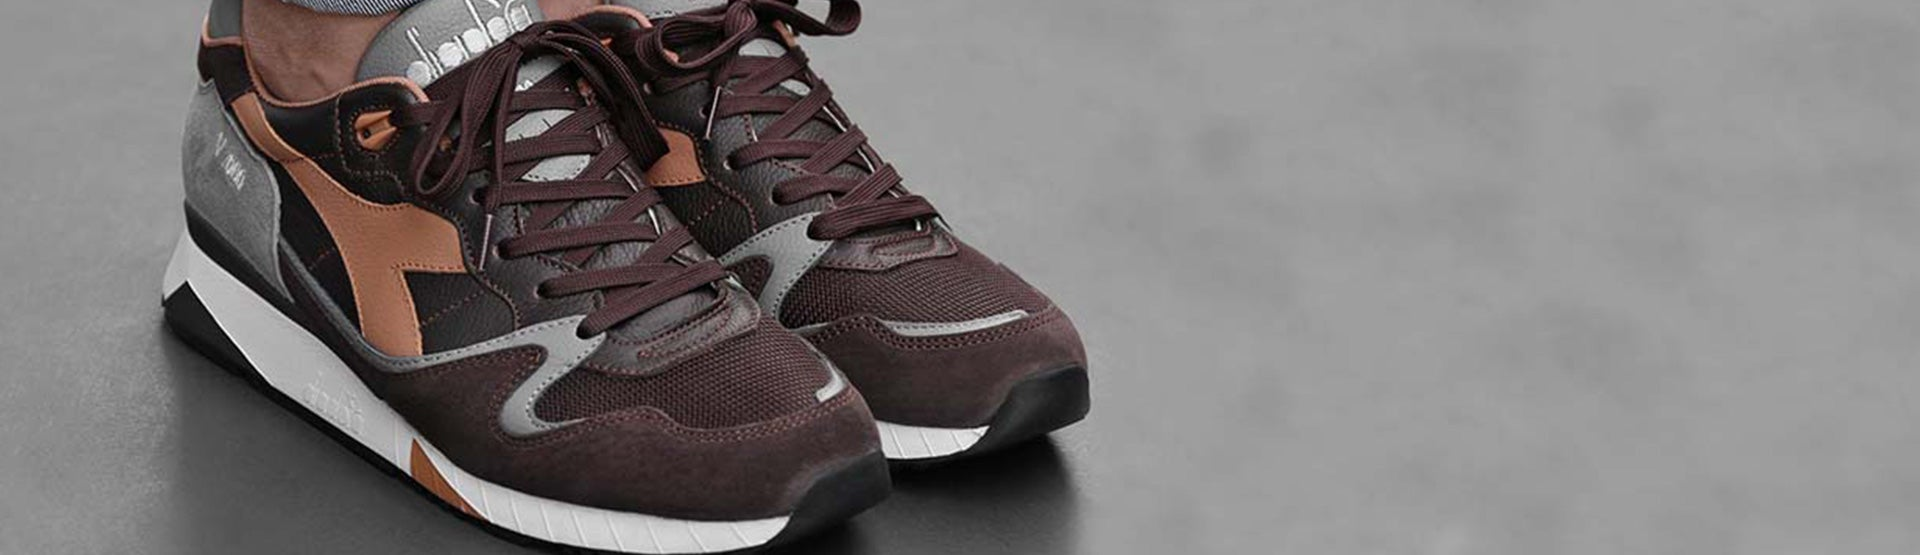 8c6c110f89 Diadora Shoes - Diadora Running Sneakers For Men & Women (Sale ...